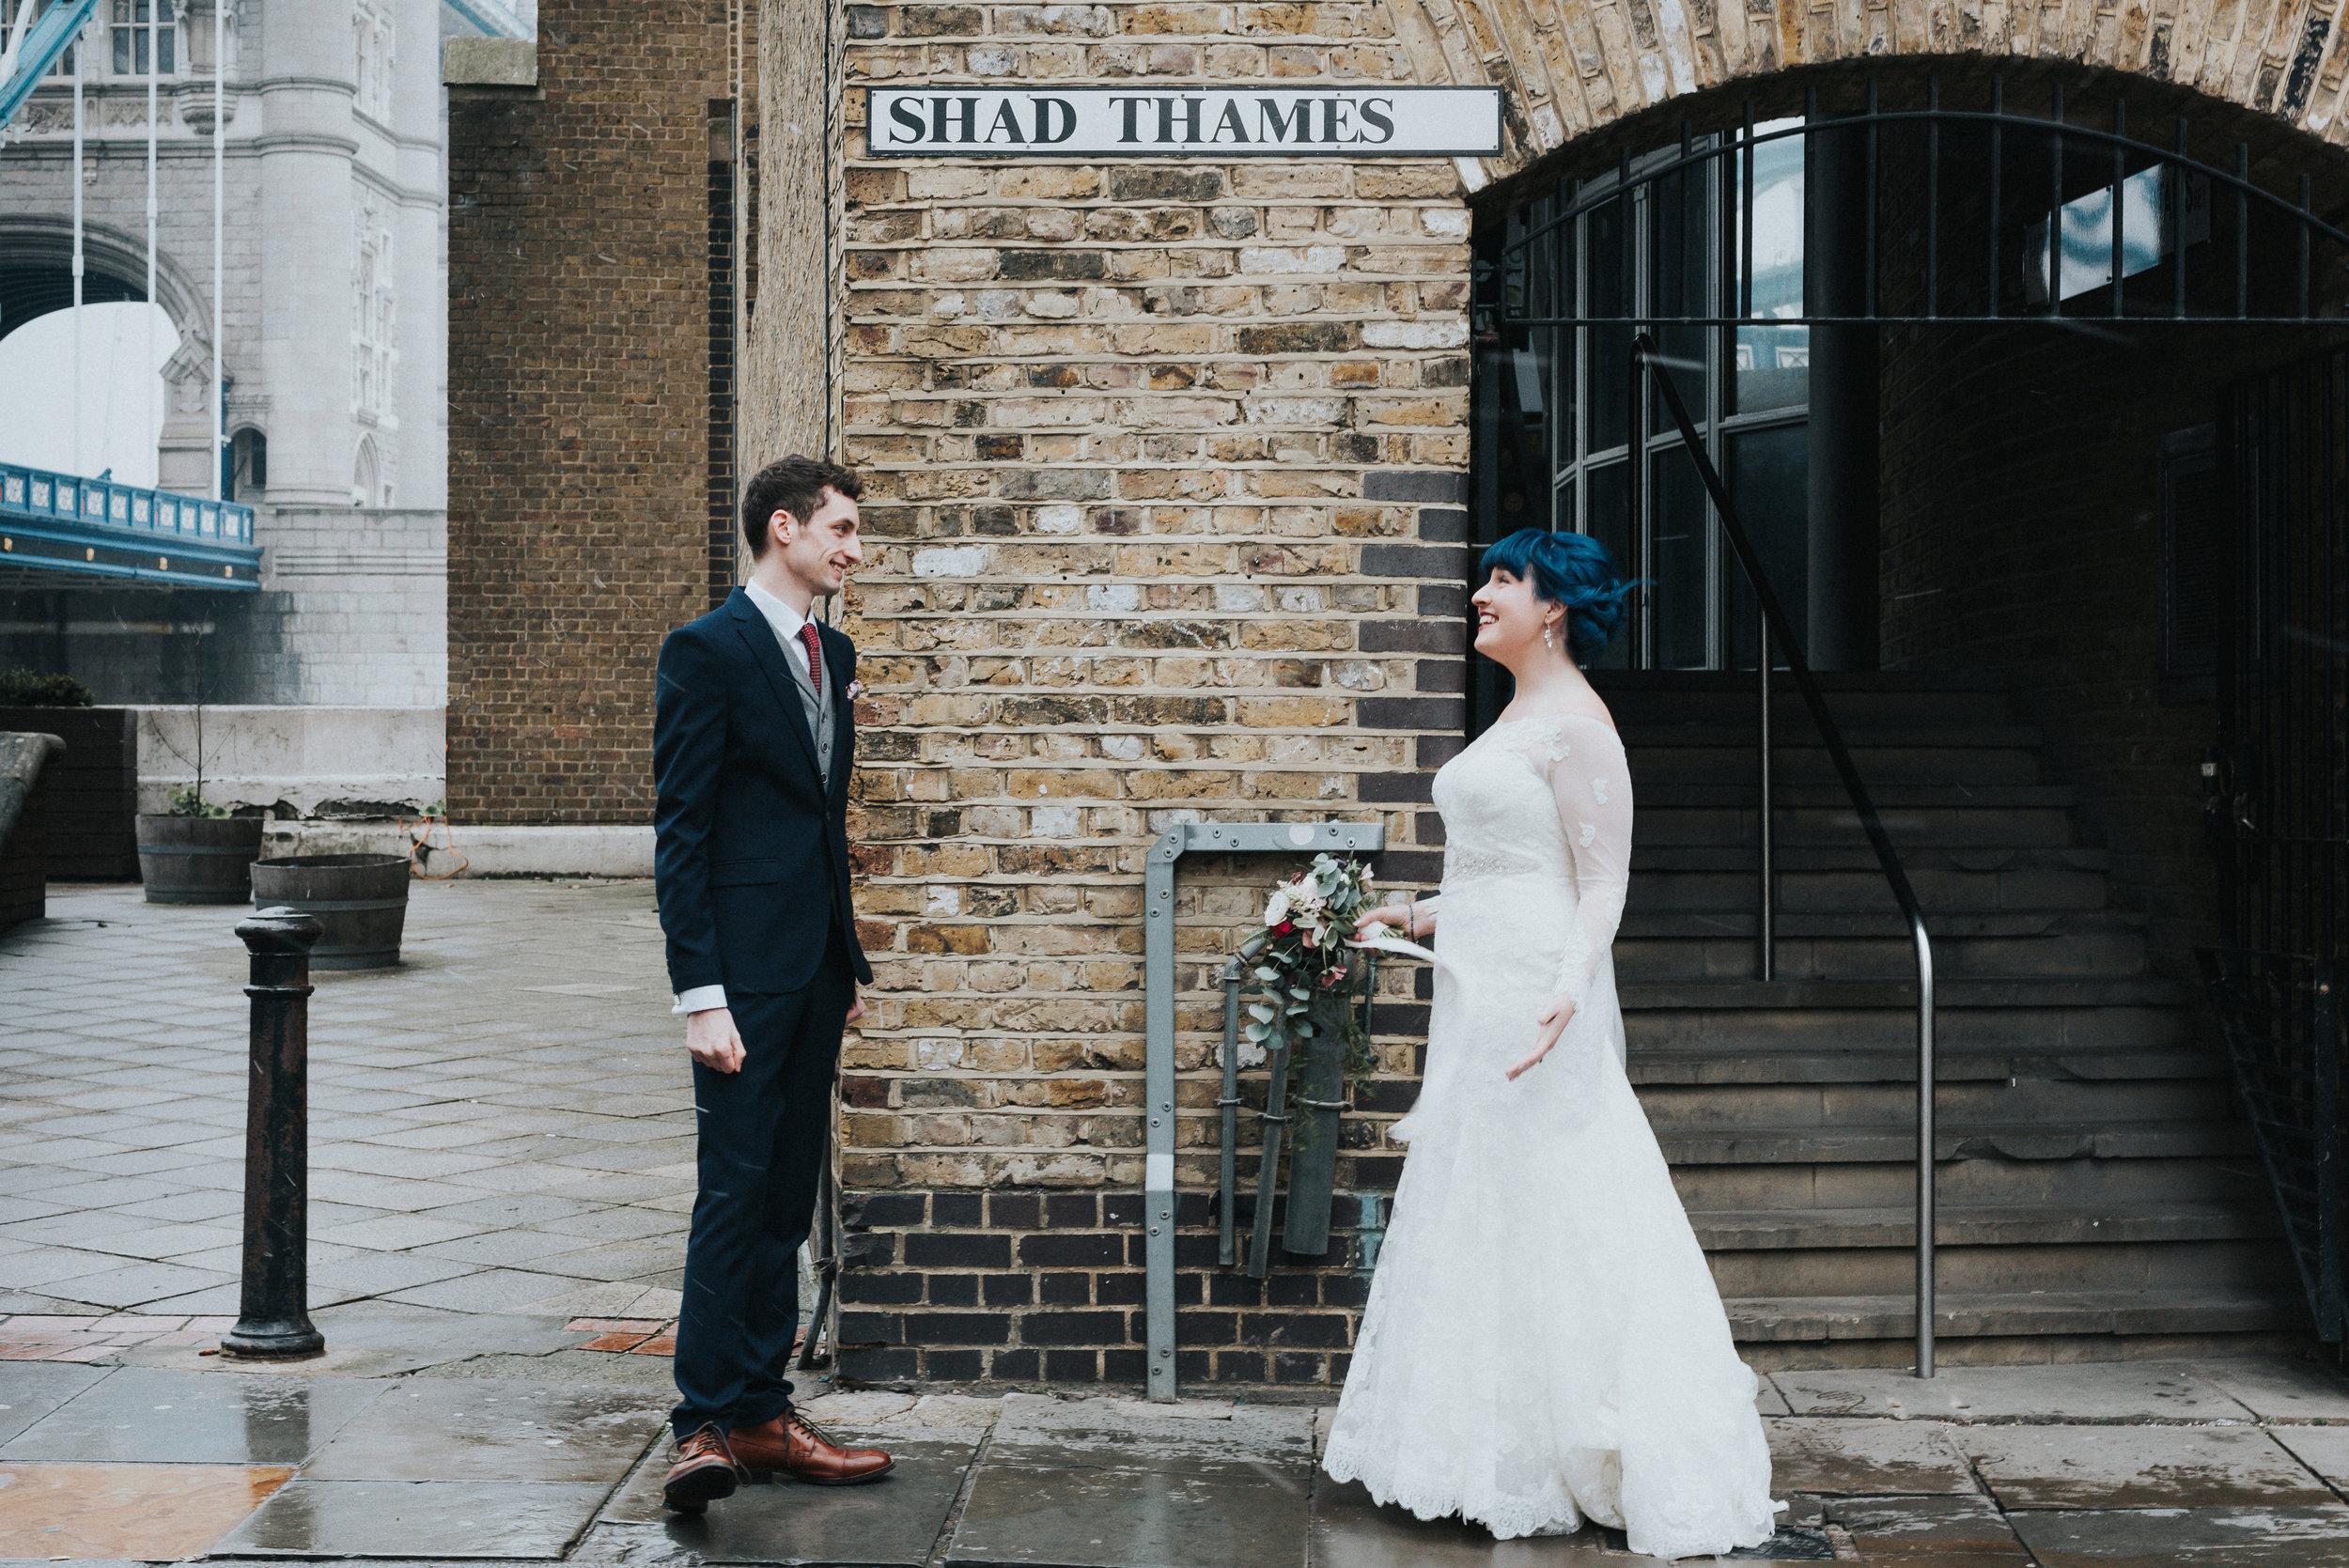 London-Chic-Alternative-Wedding-Jay-Tunbridge-Photographic-Co-6.jpg